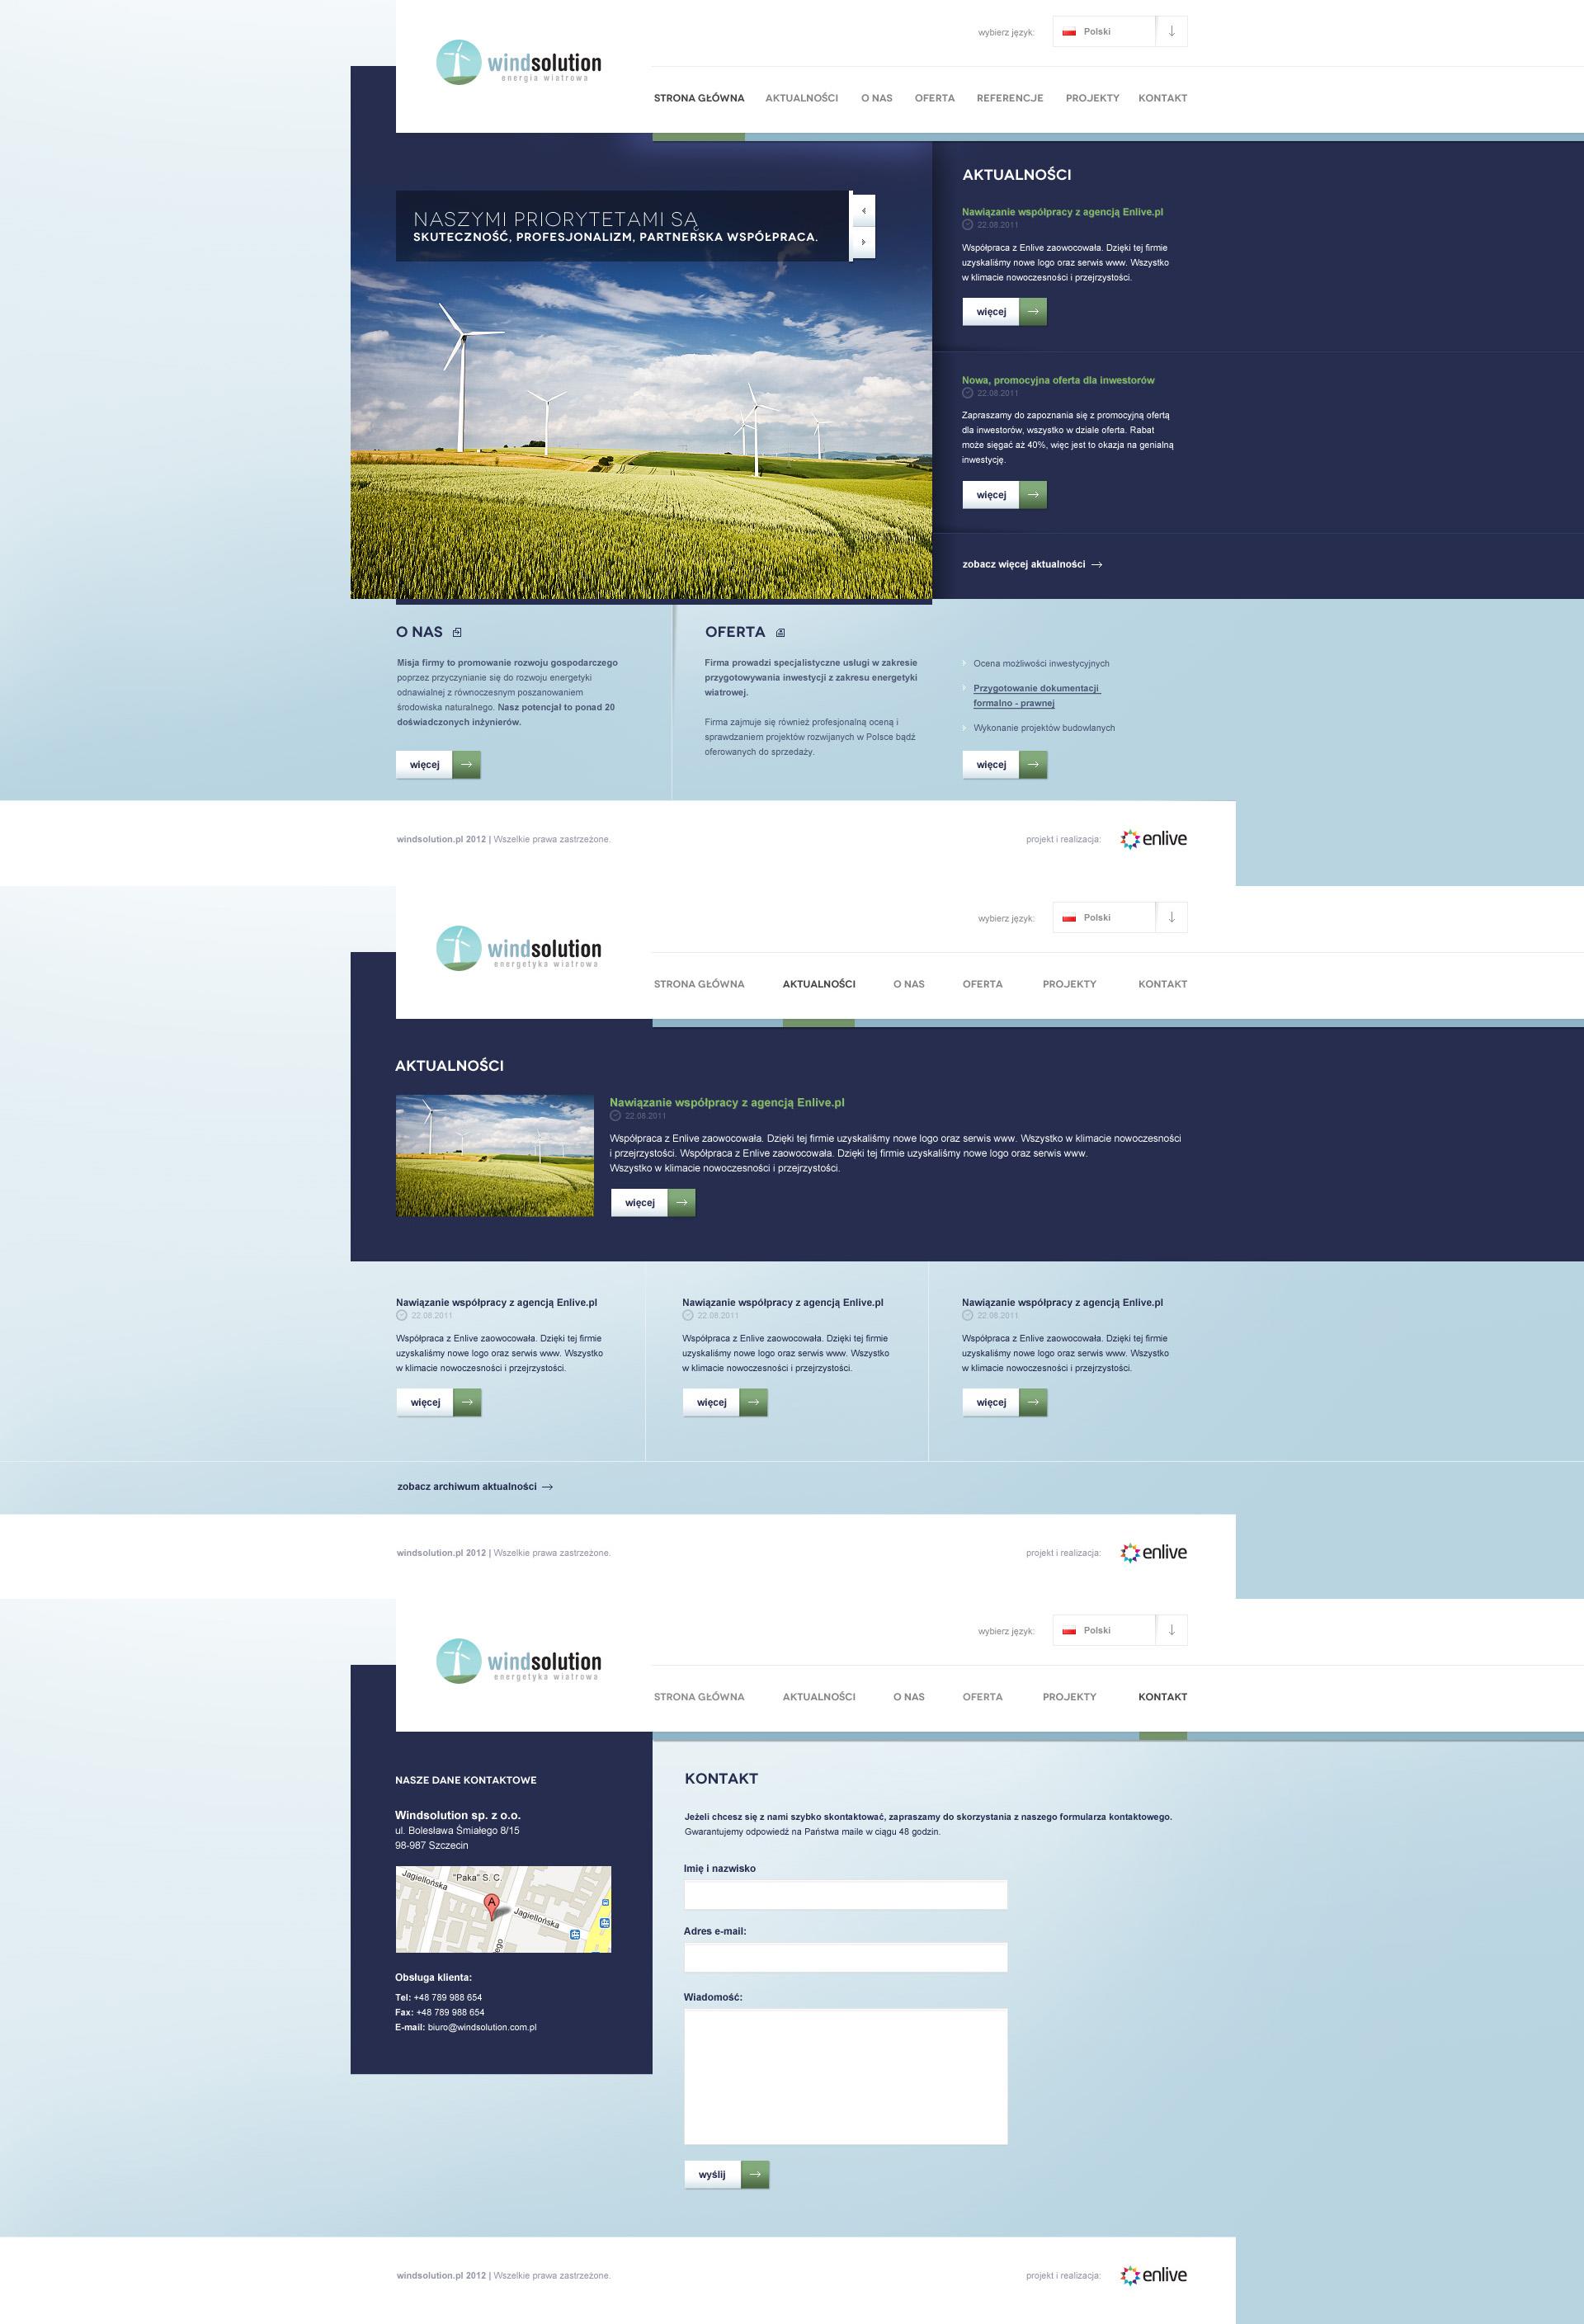 Windsolution website by PapciuZiom